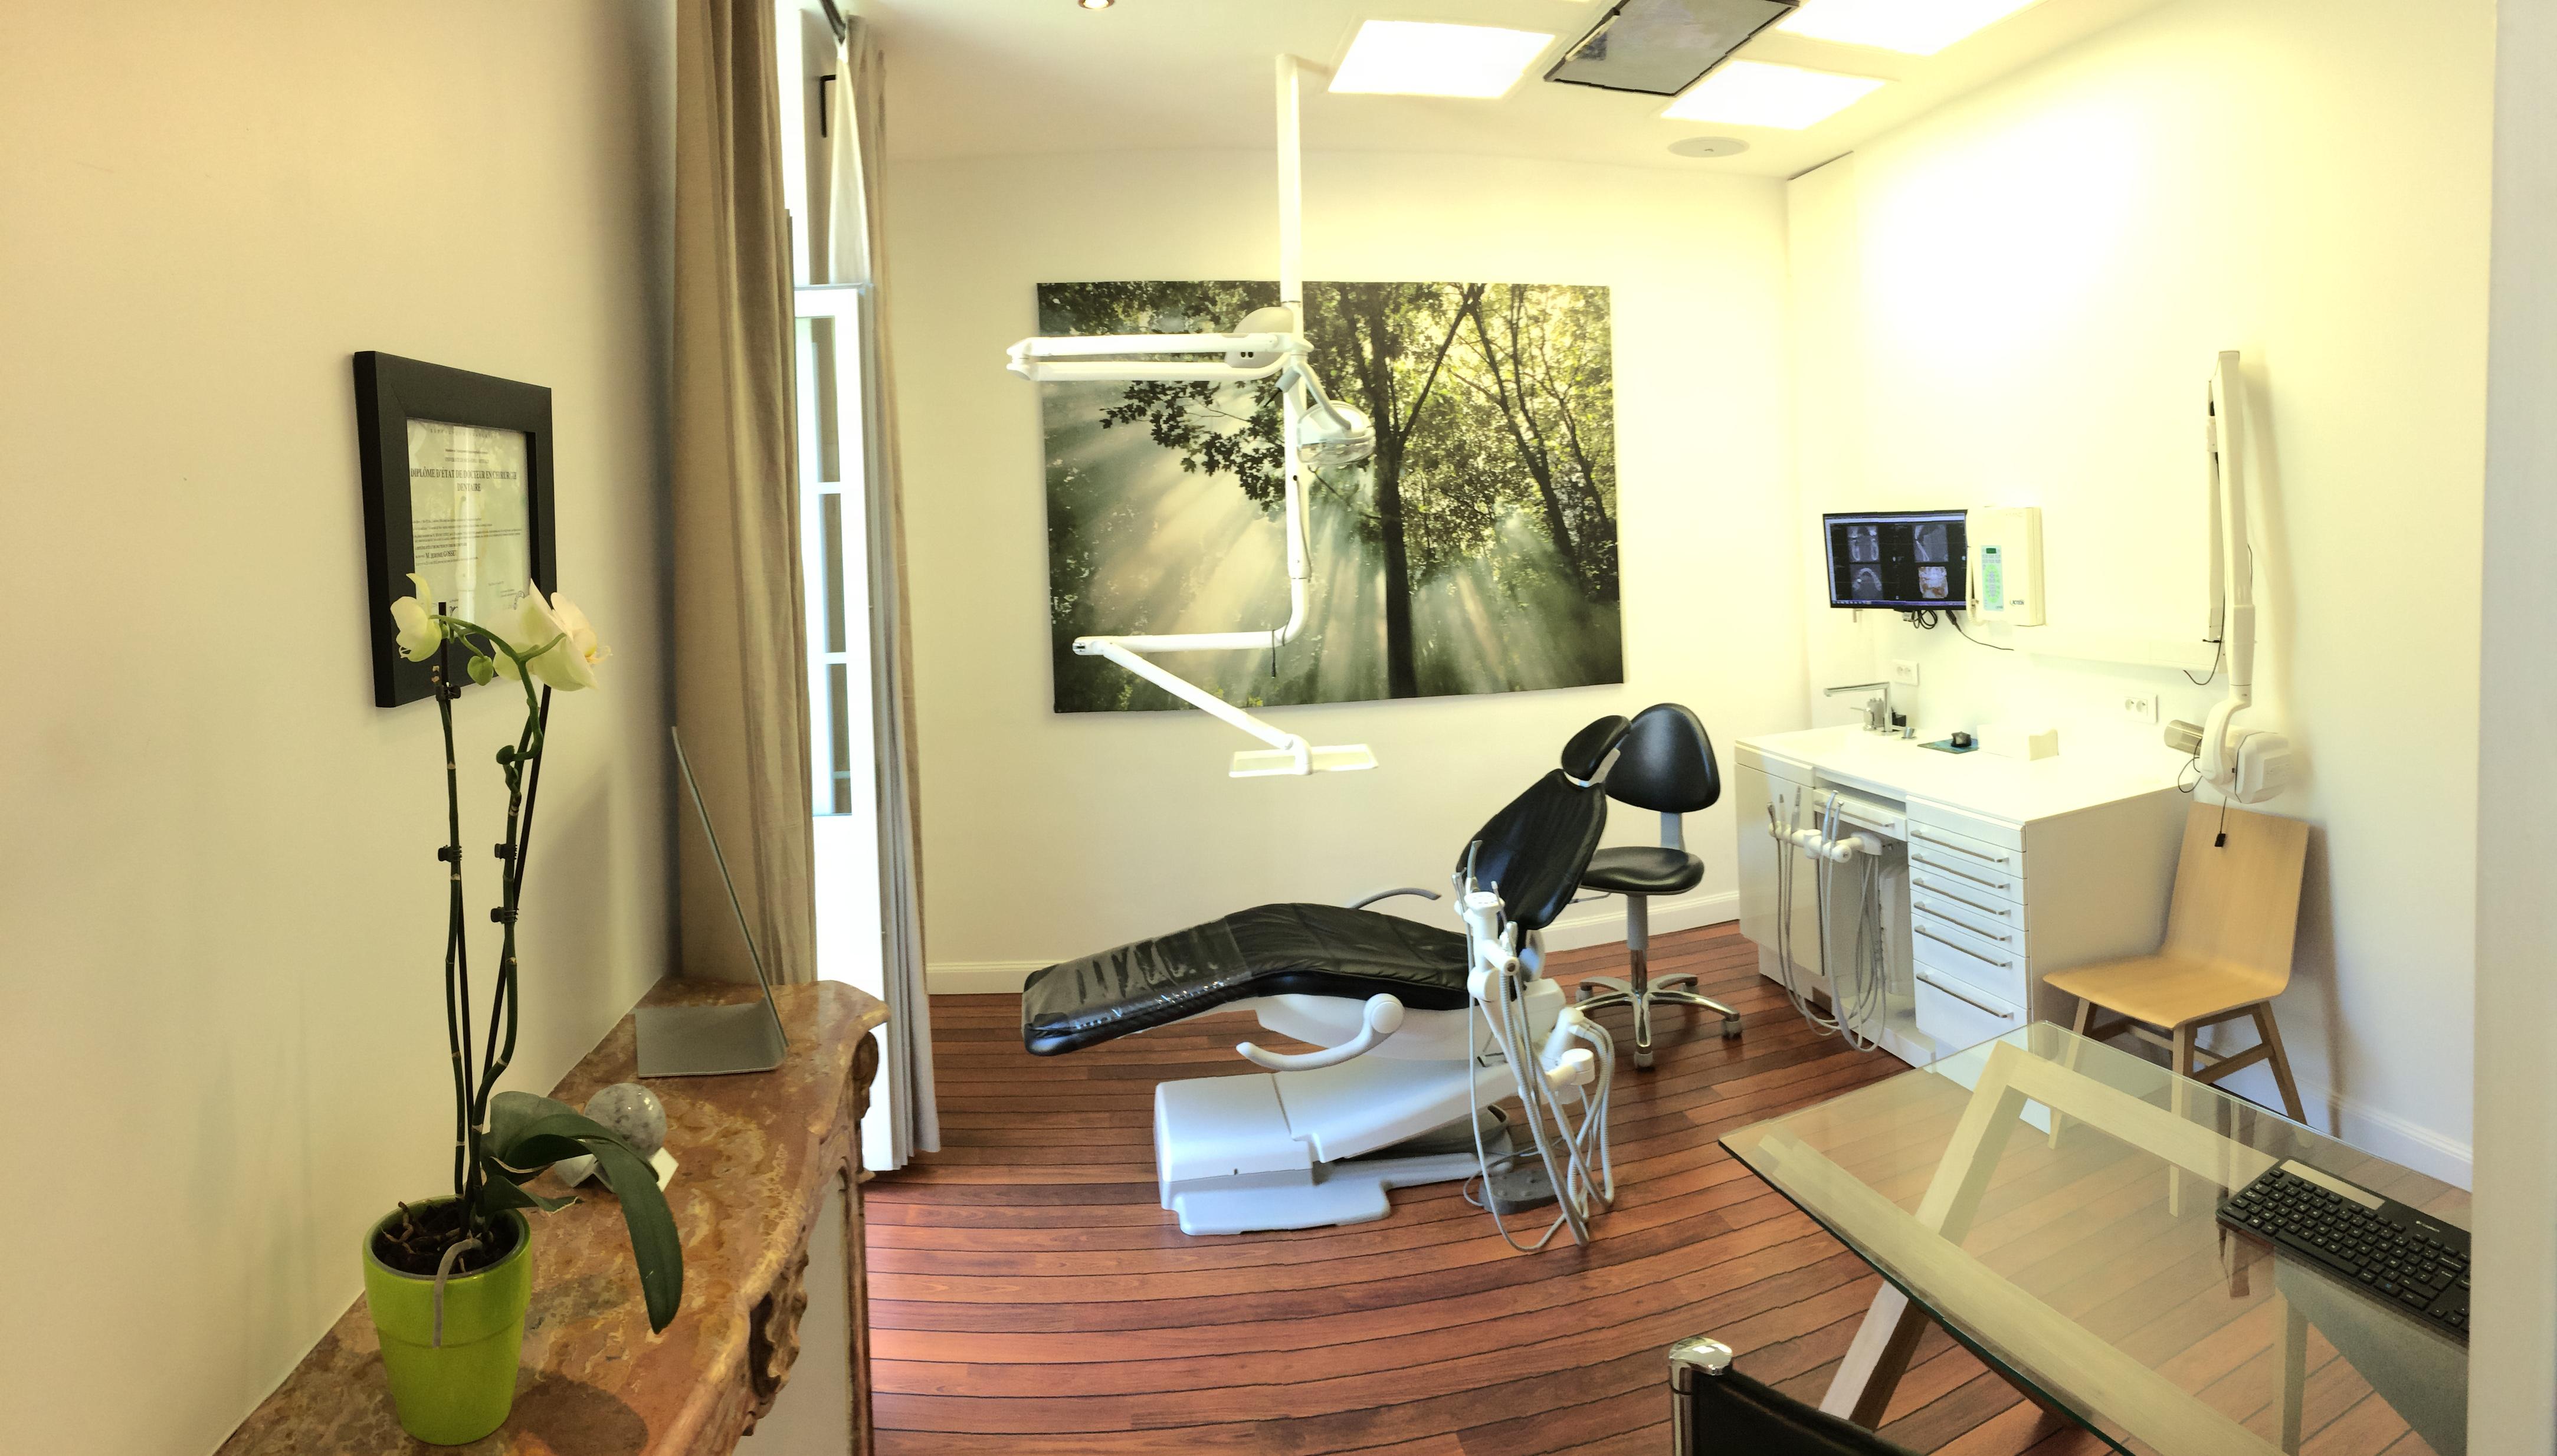 Dentiste Puget Théniers